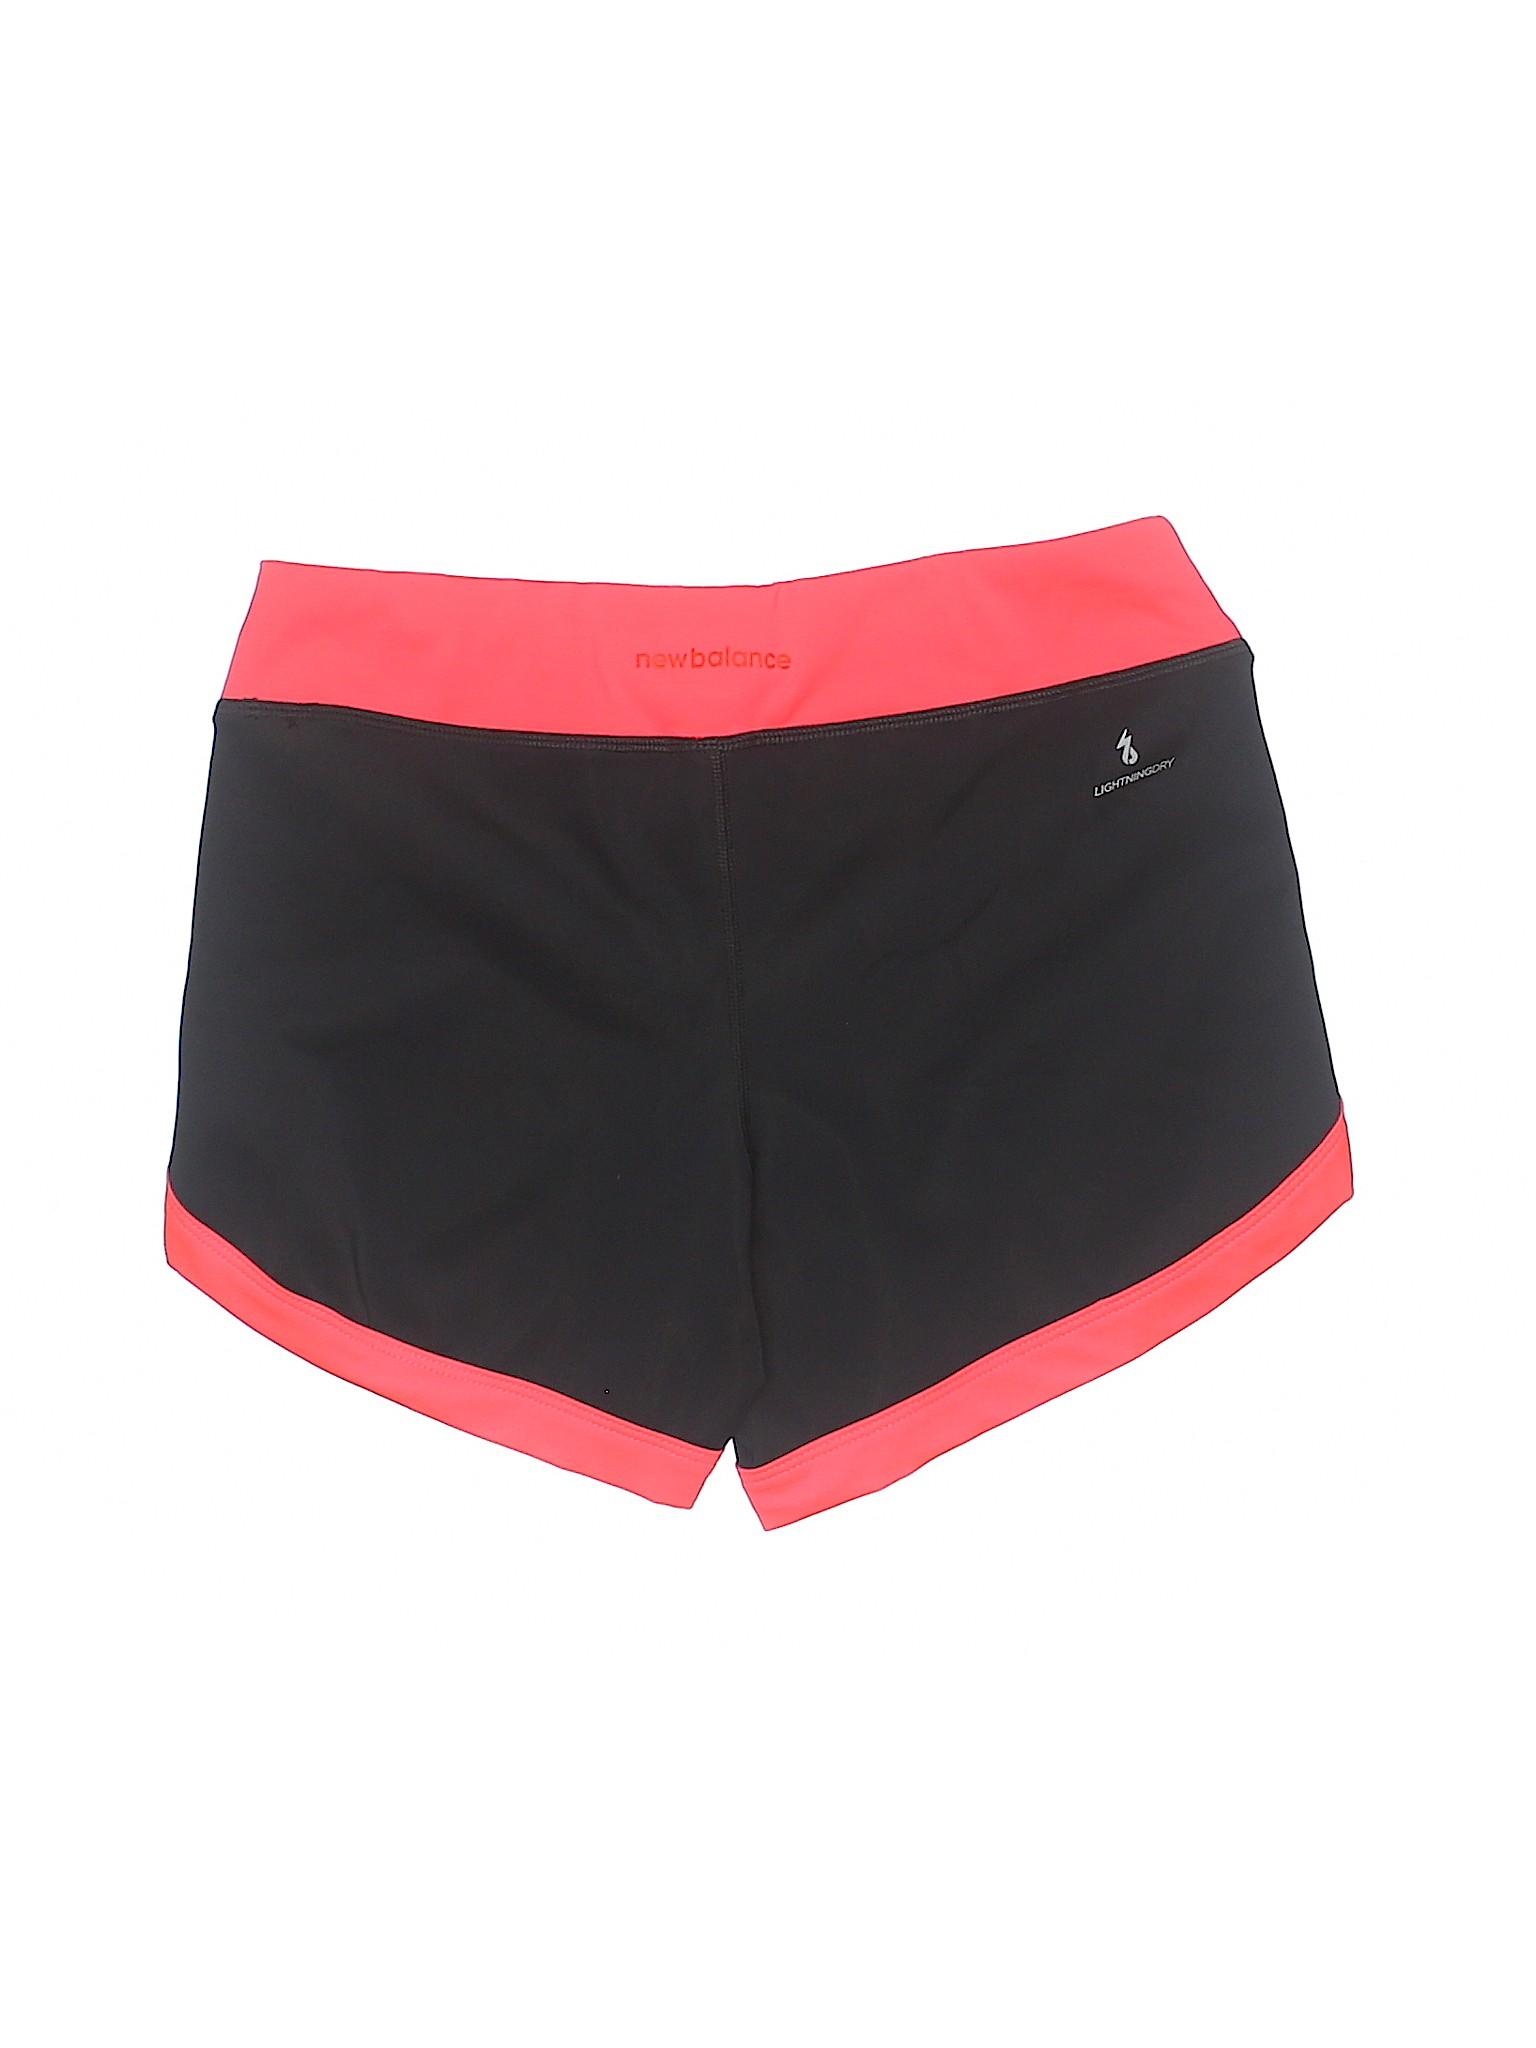 Balance New Boutique Boutique Athletic Shorts New qv1CHxw8